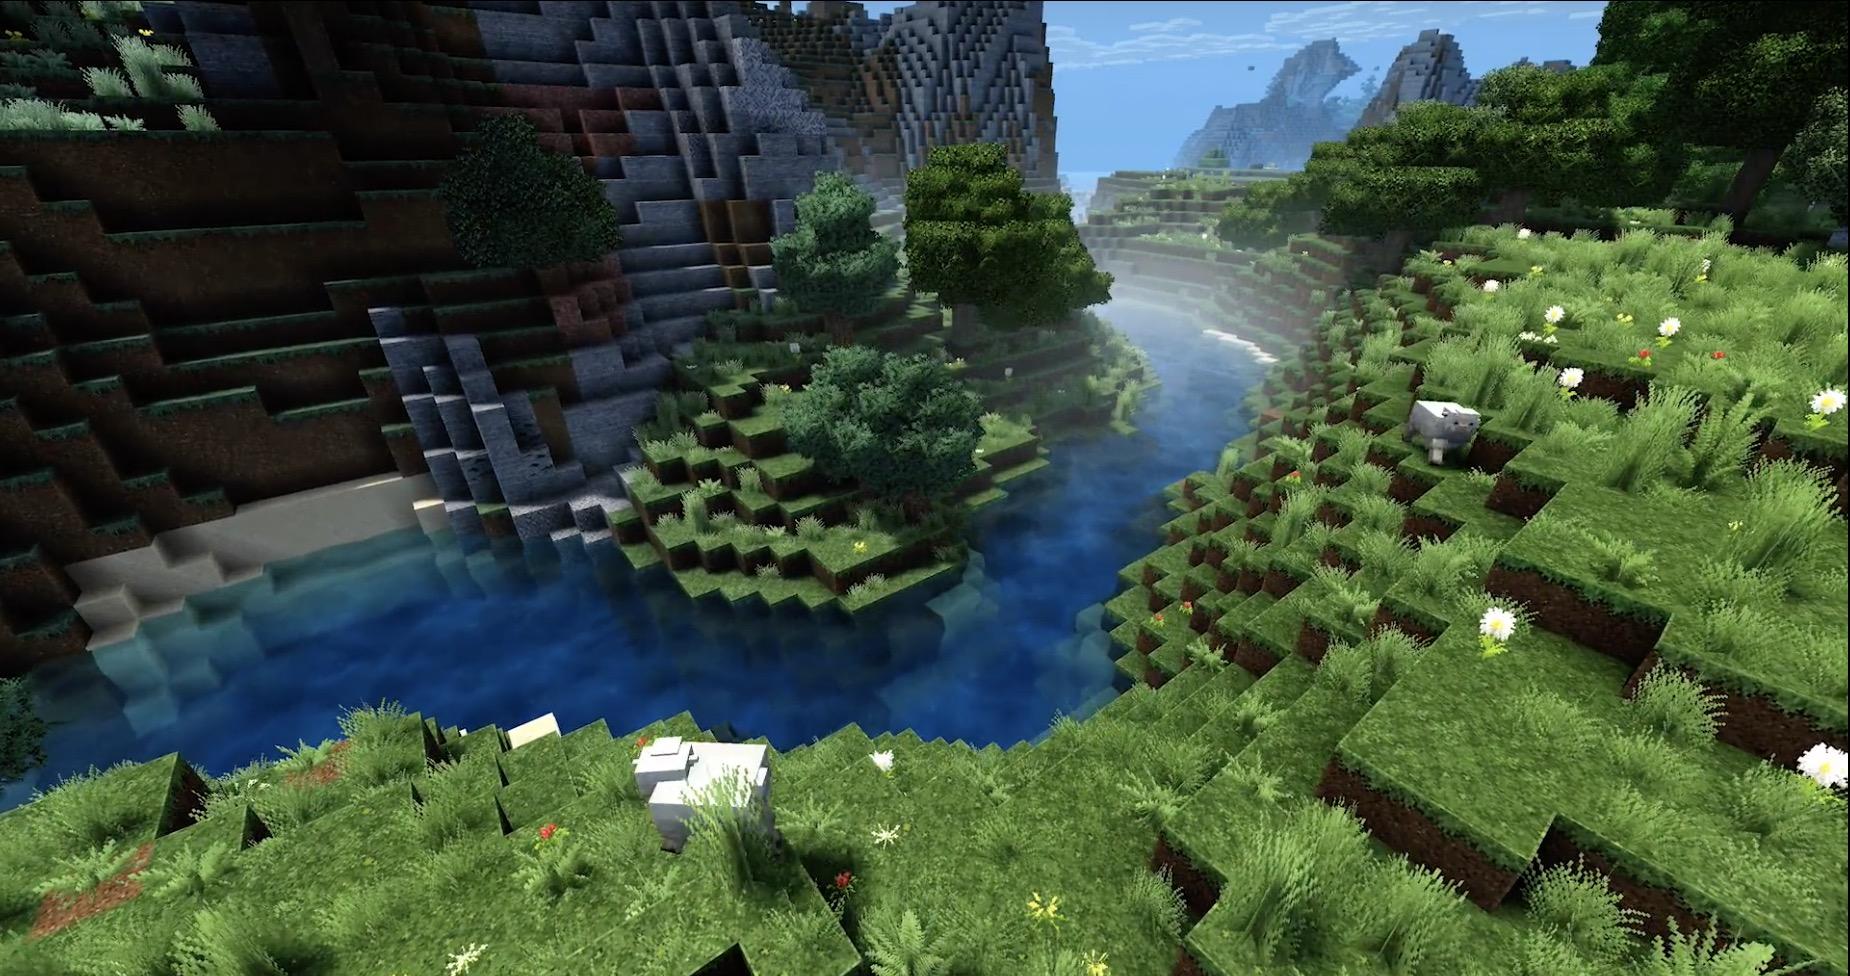 Minecraft team puts Super Duper Graphics on blocks: It's